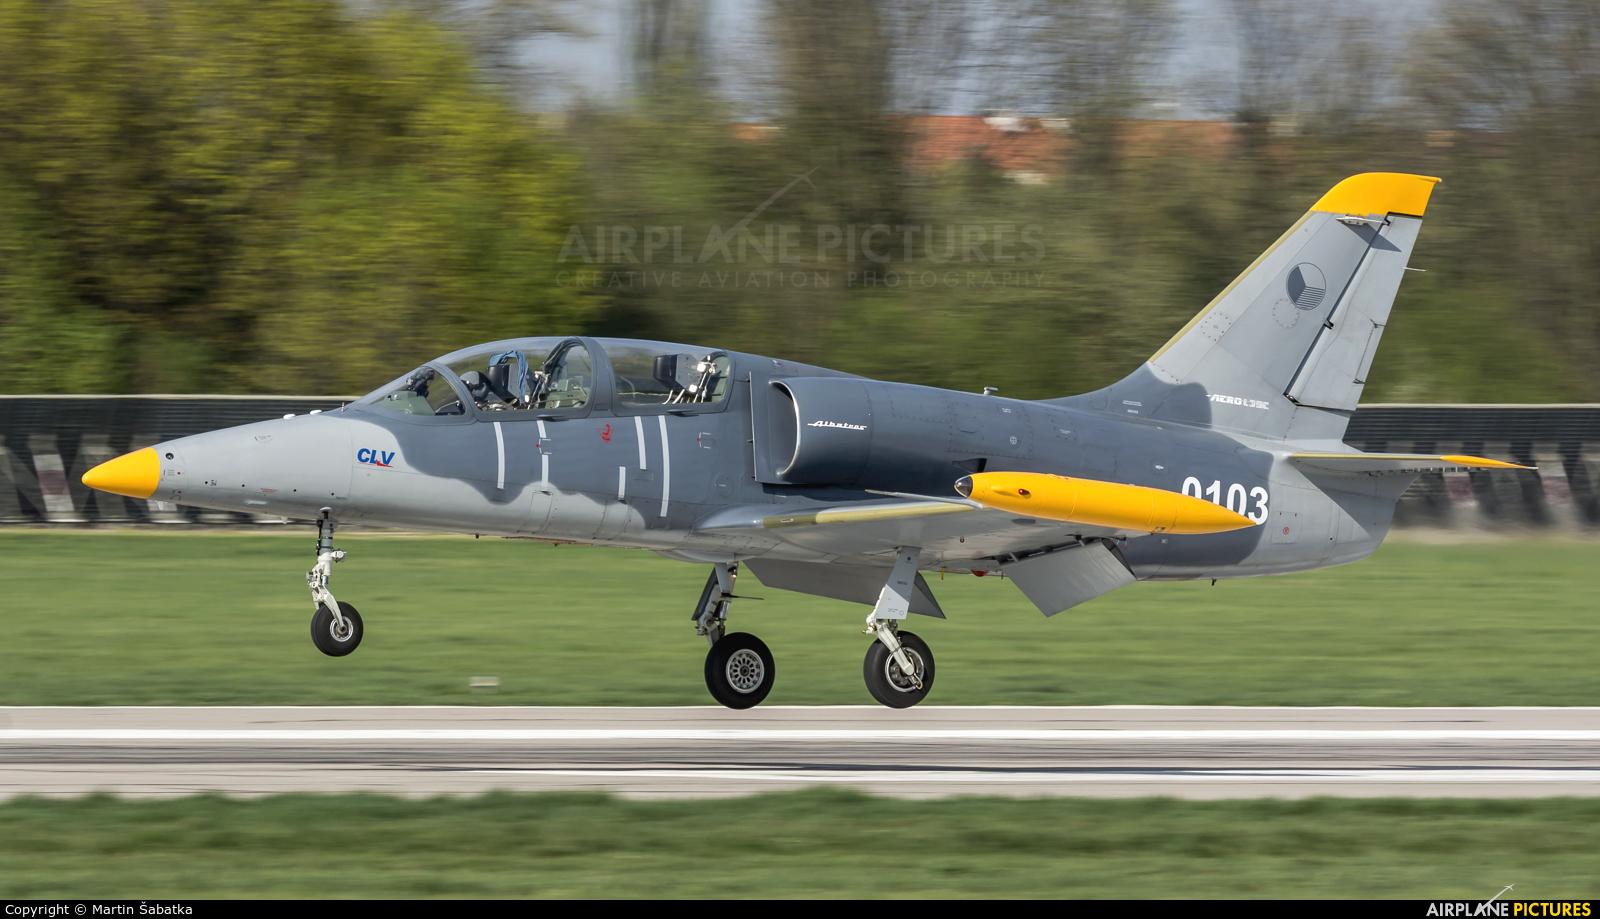 Czech - Air Force 0103 aircraft at Pardubice